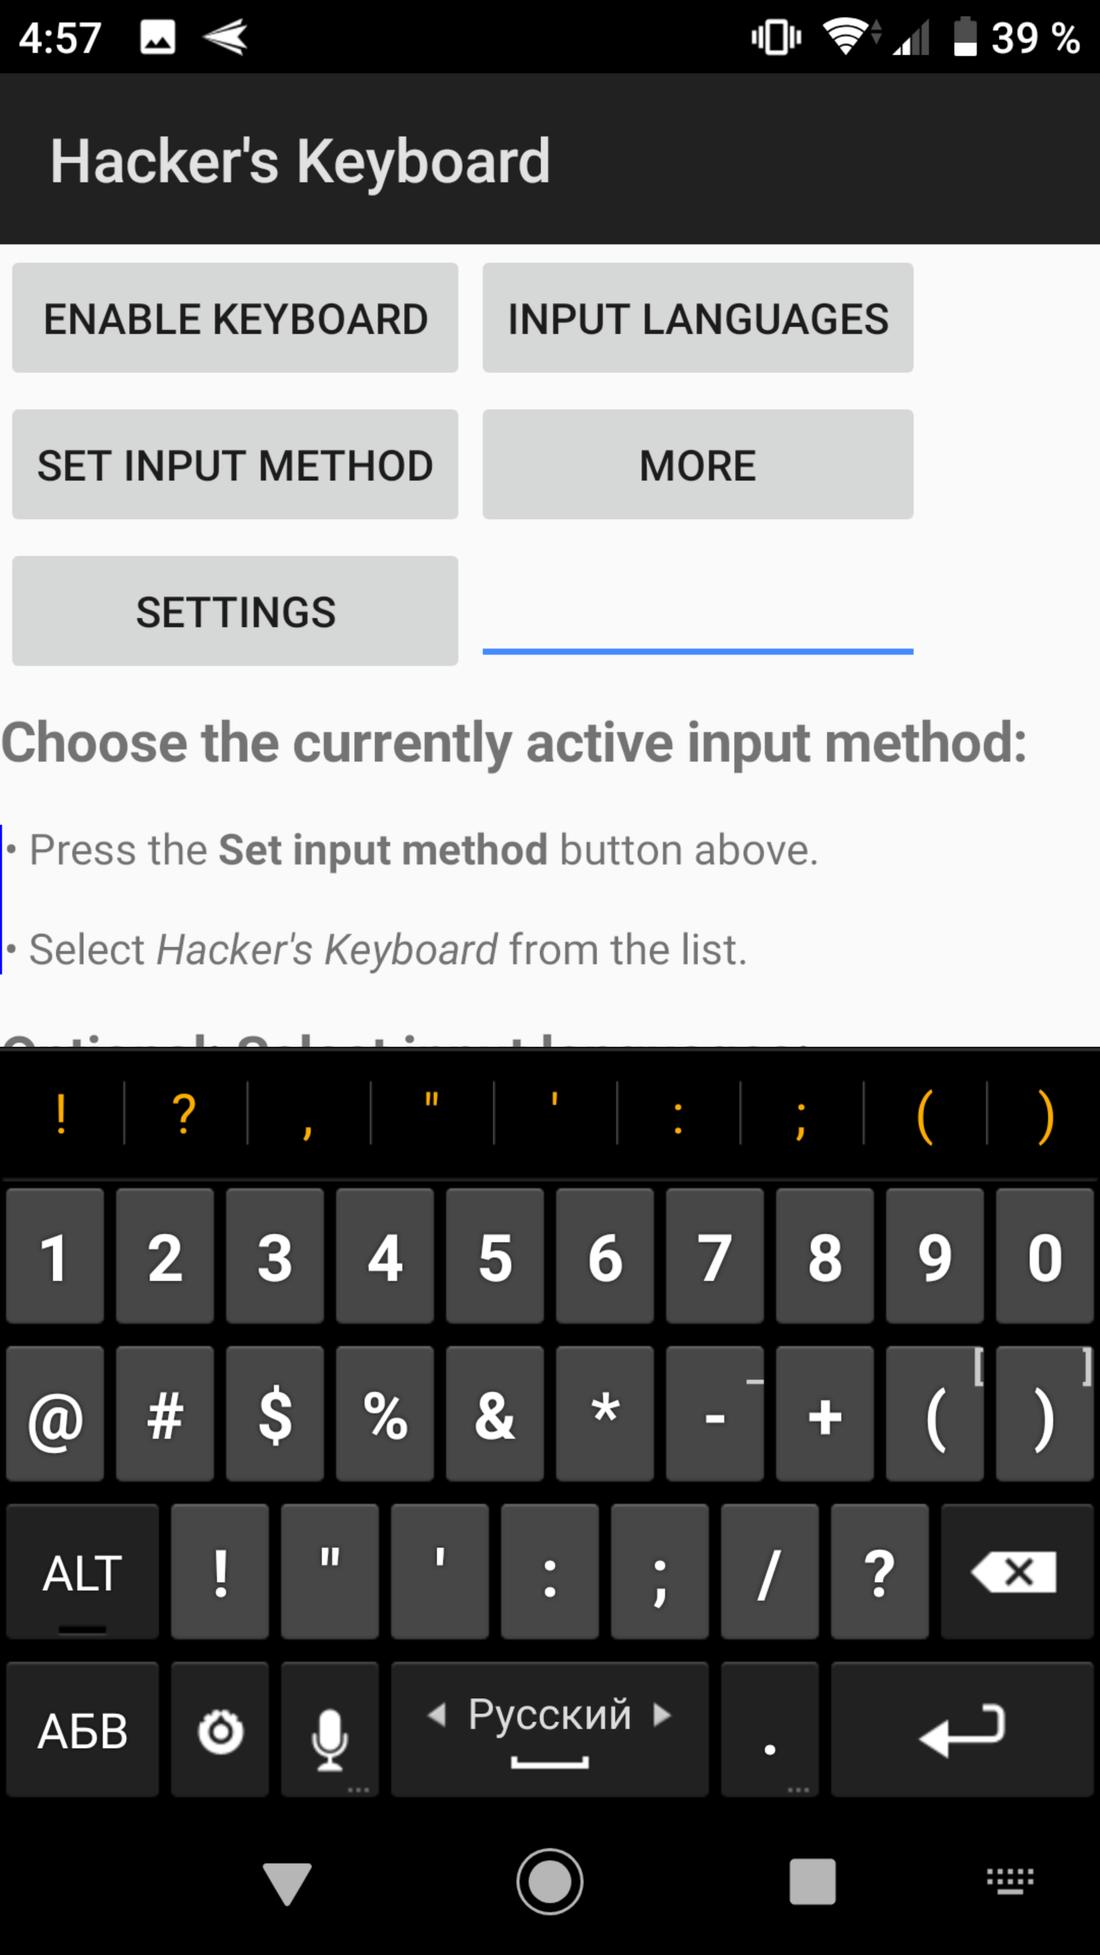 Скриншот #3 из программы Hacker\'s Keyboard